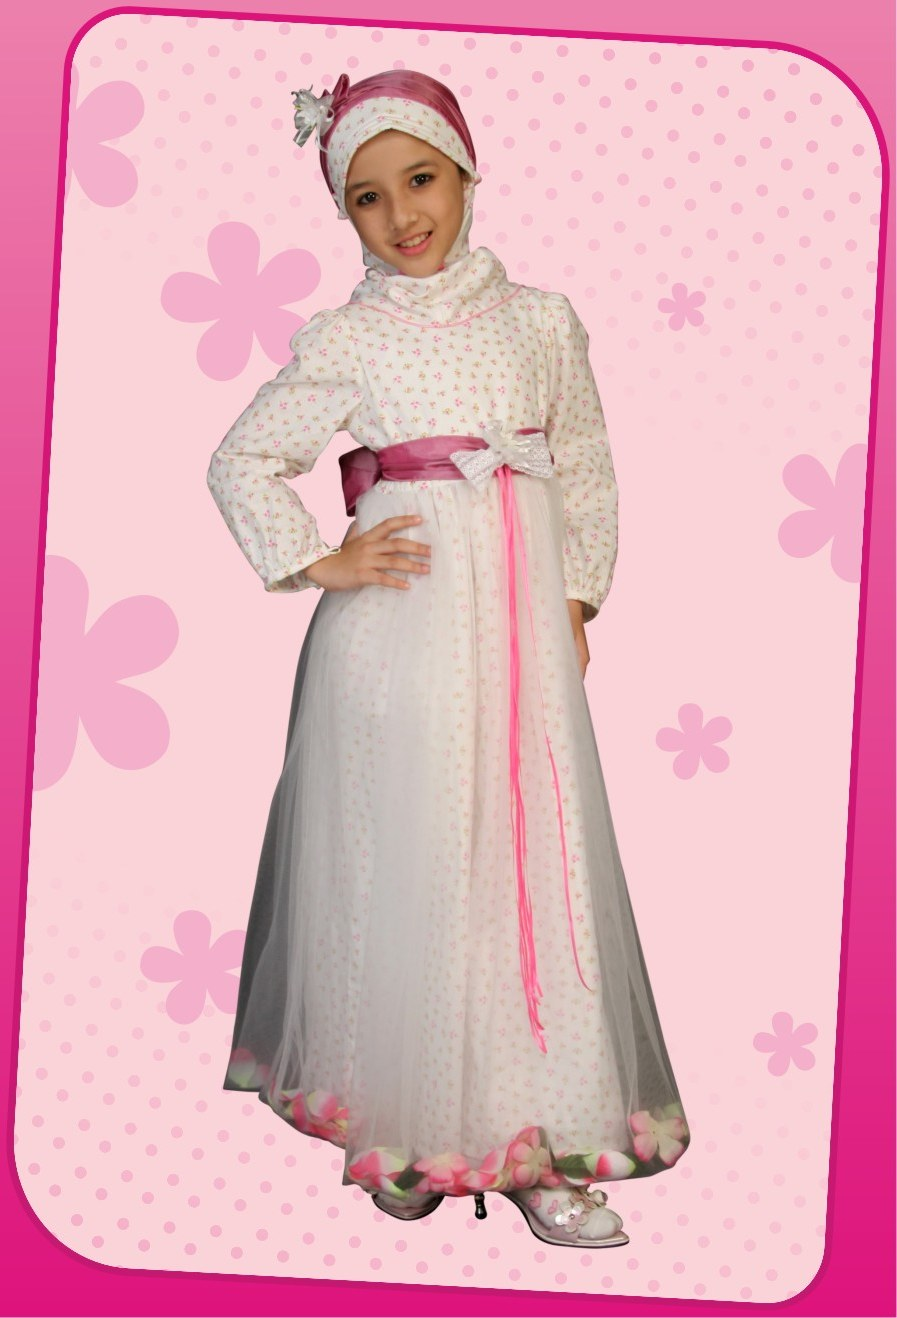 Inspirasi Baju Lebaran Untuk Bayi Perempuan Jxdu Trend Busana Muslim Anak Perempuan 2016 Busana Muslim Terbaru